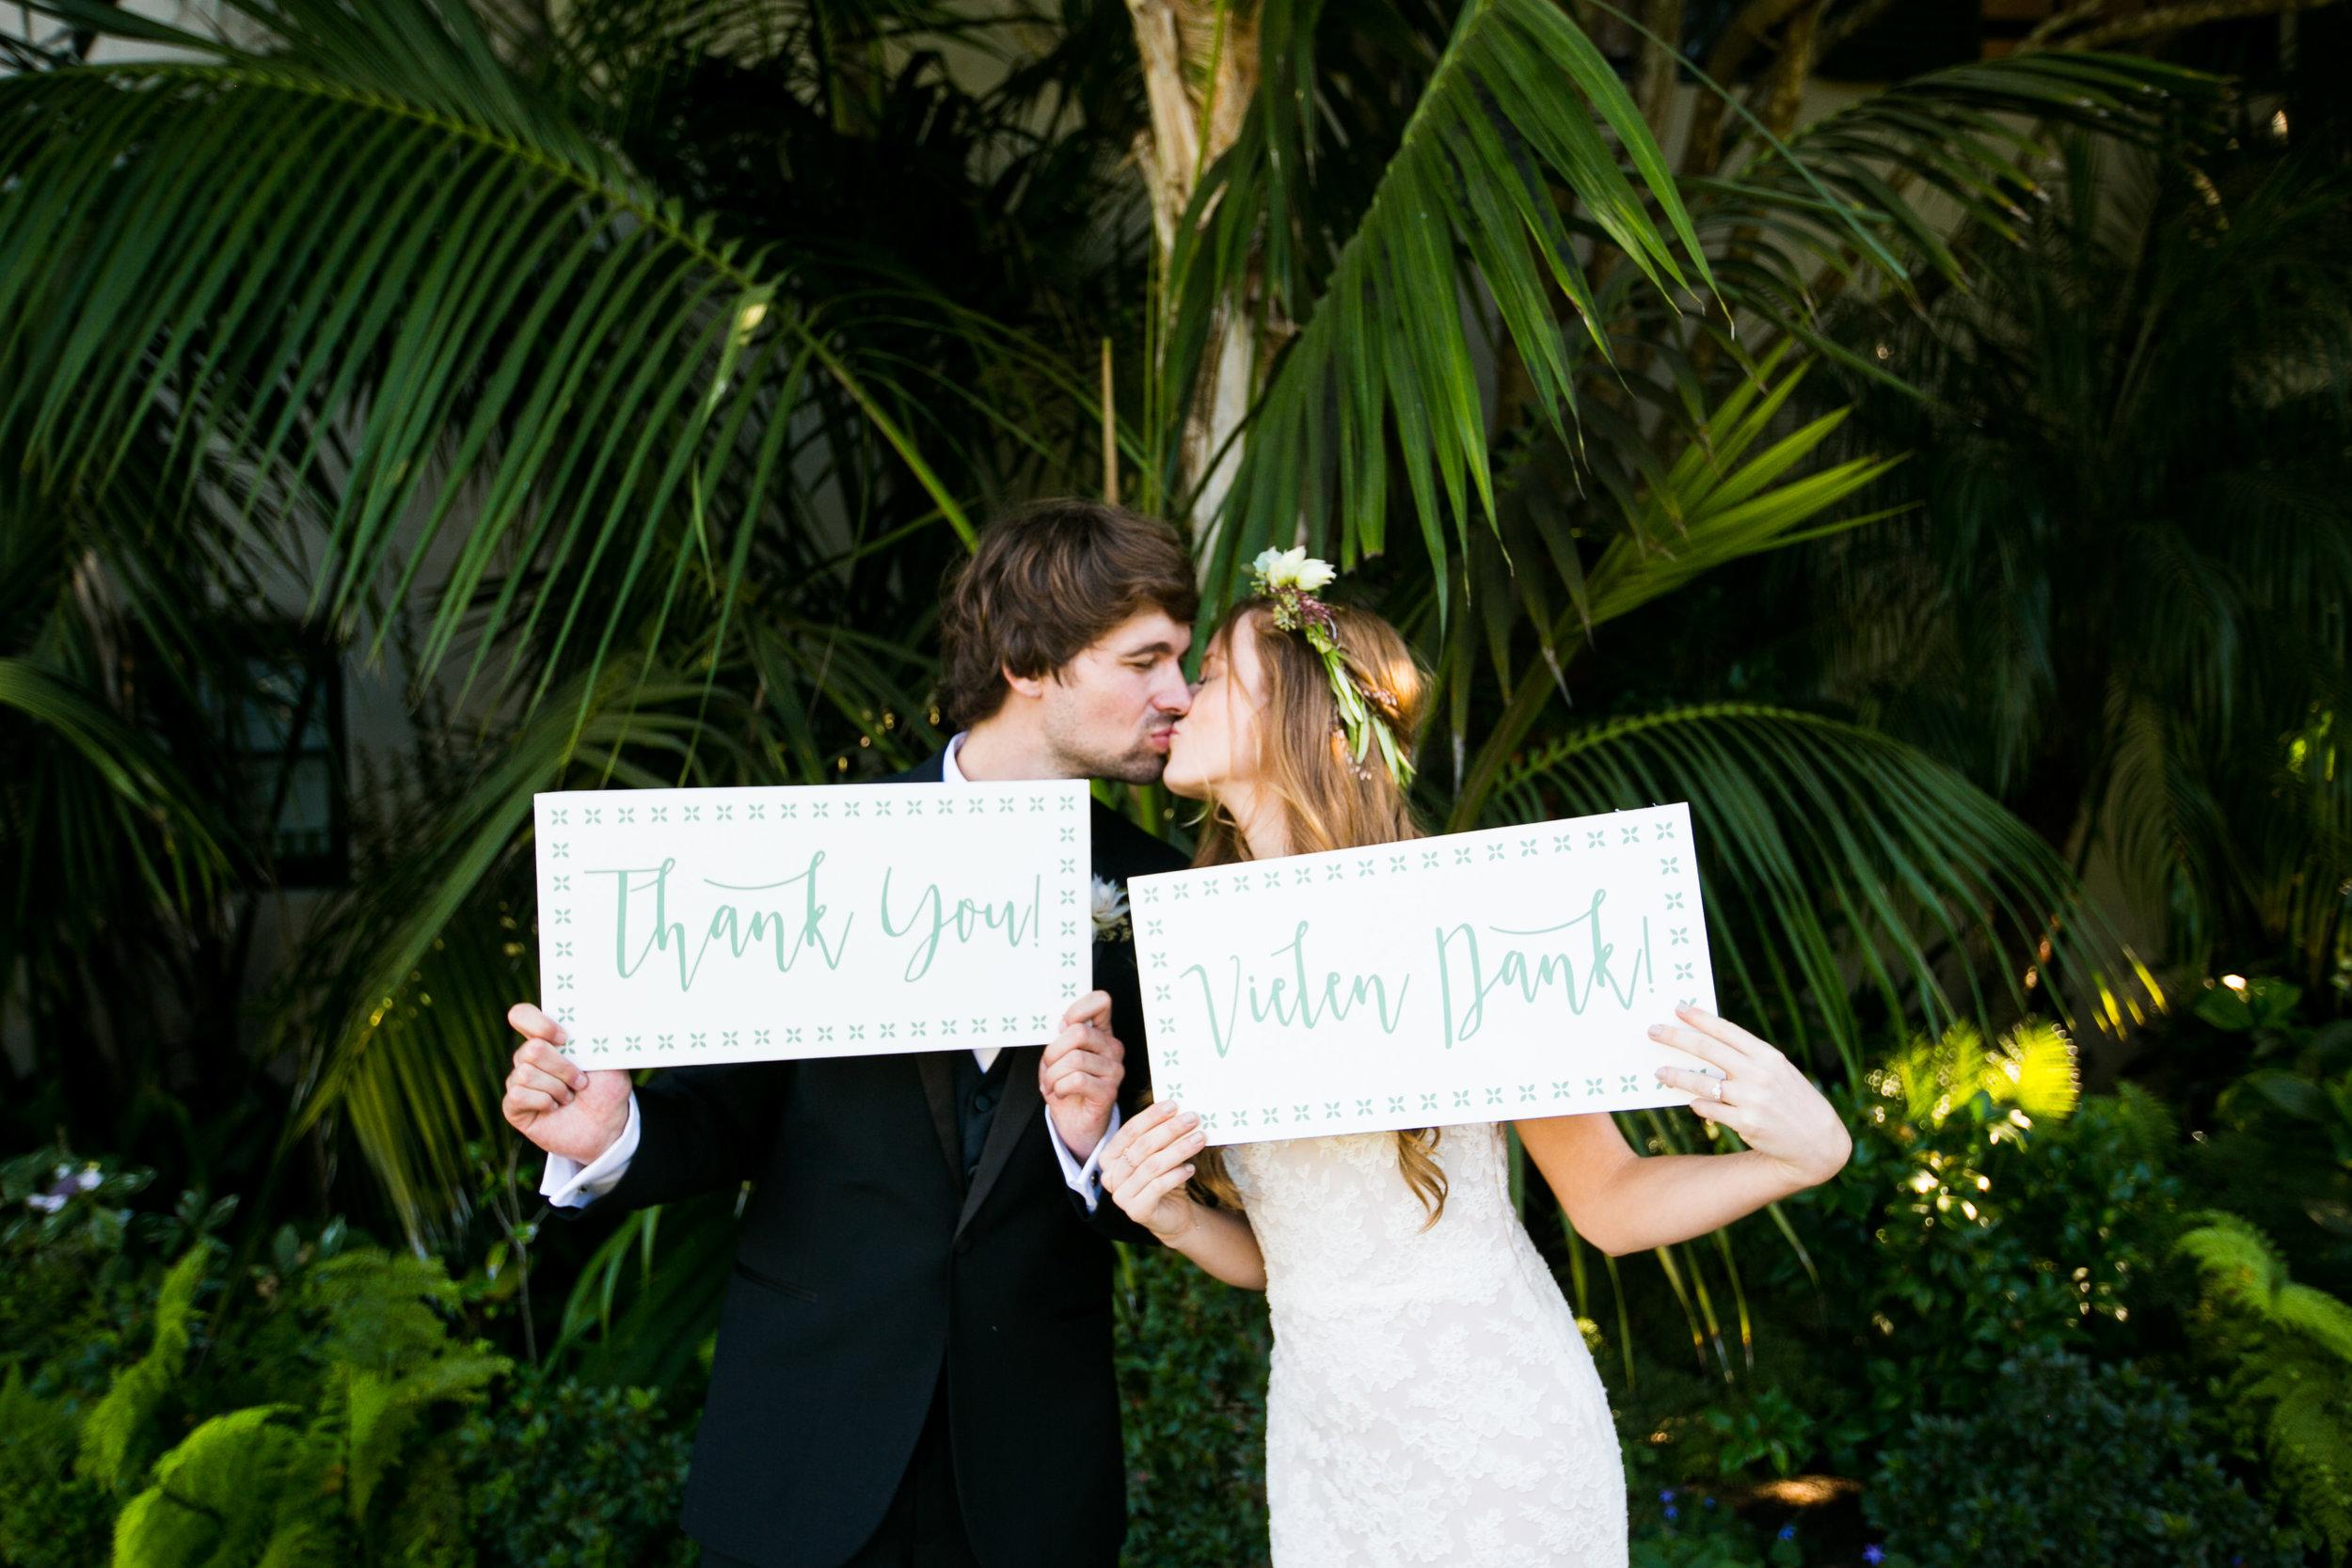 www.santabarbarawedding.com   Four Seasons Santa Barbara   Levine Fox Events   Callaway Gable Photo   Bride and Groom